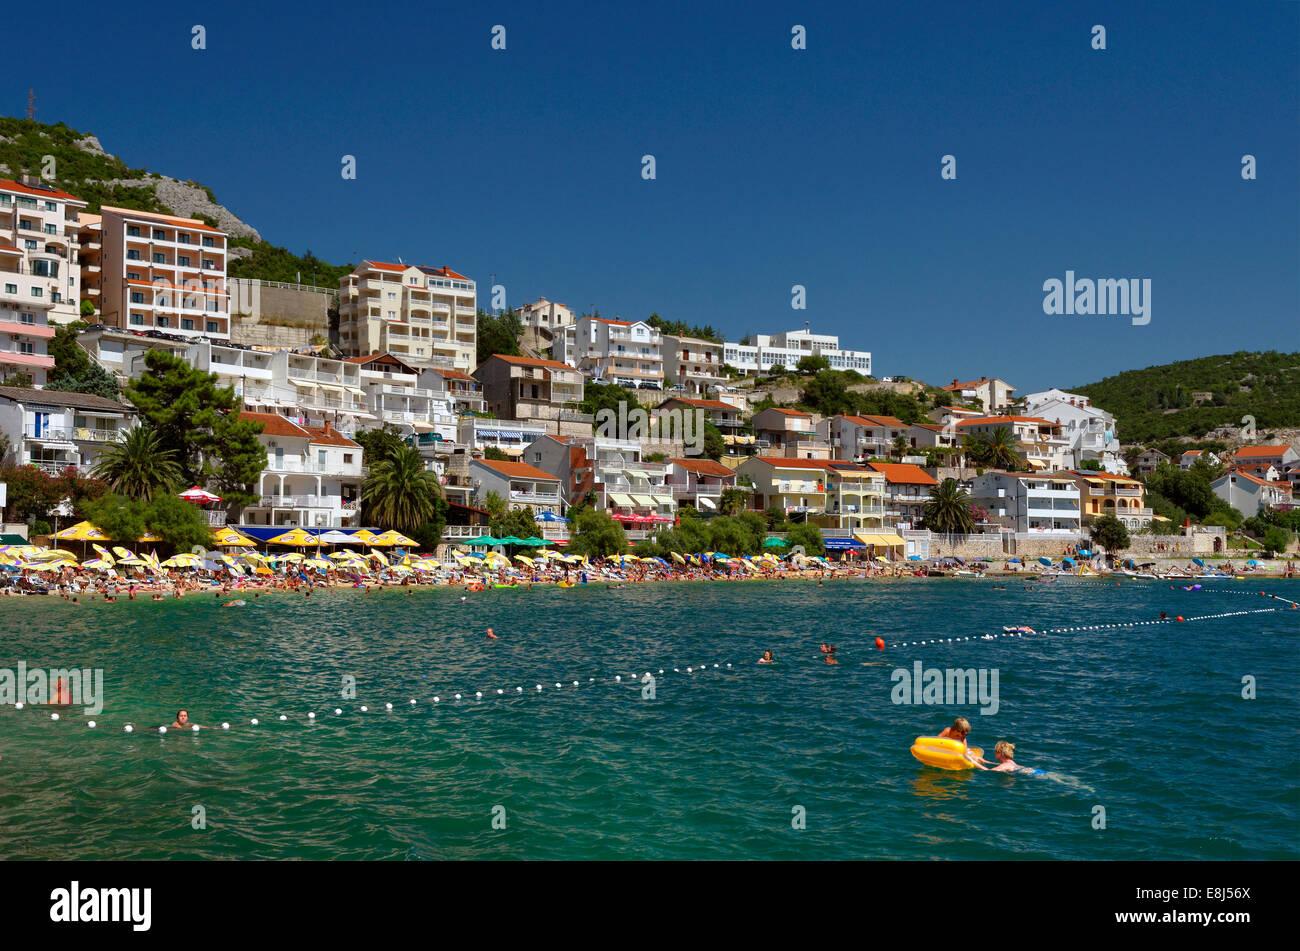 Adriatic coastal town of Neum in Herzegovina-Neretva Canton, Bosnia and Herzegovina - Stock Image